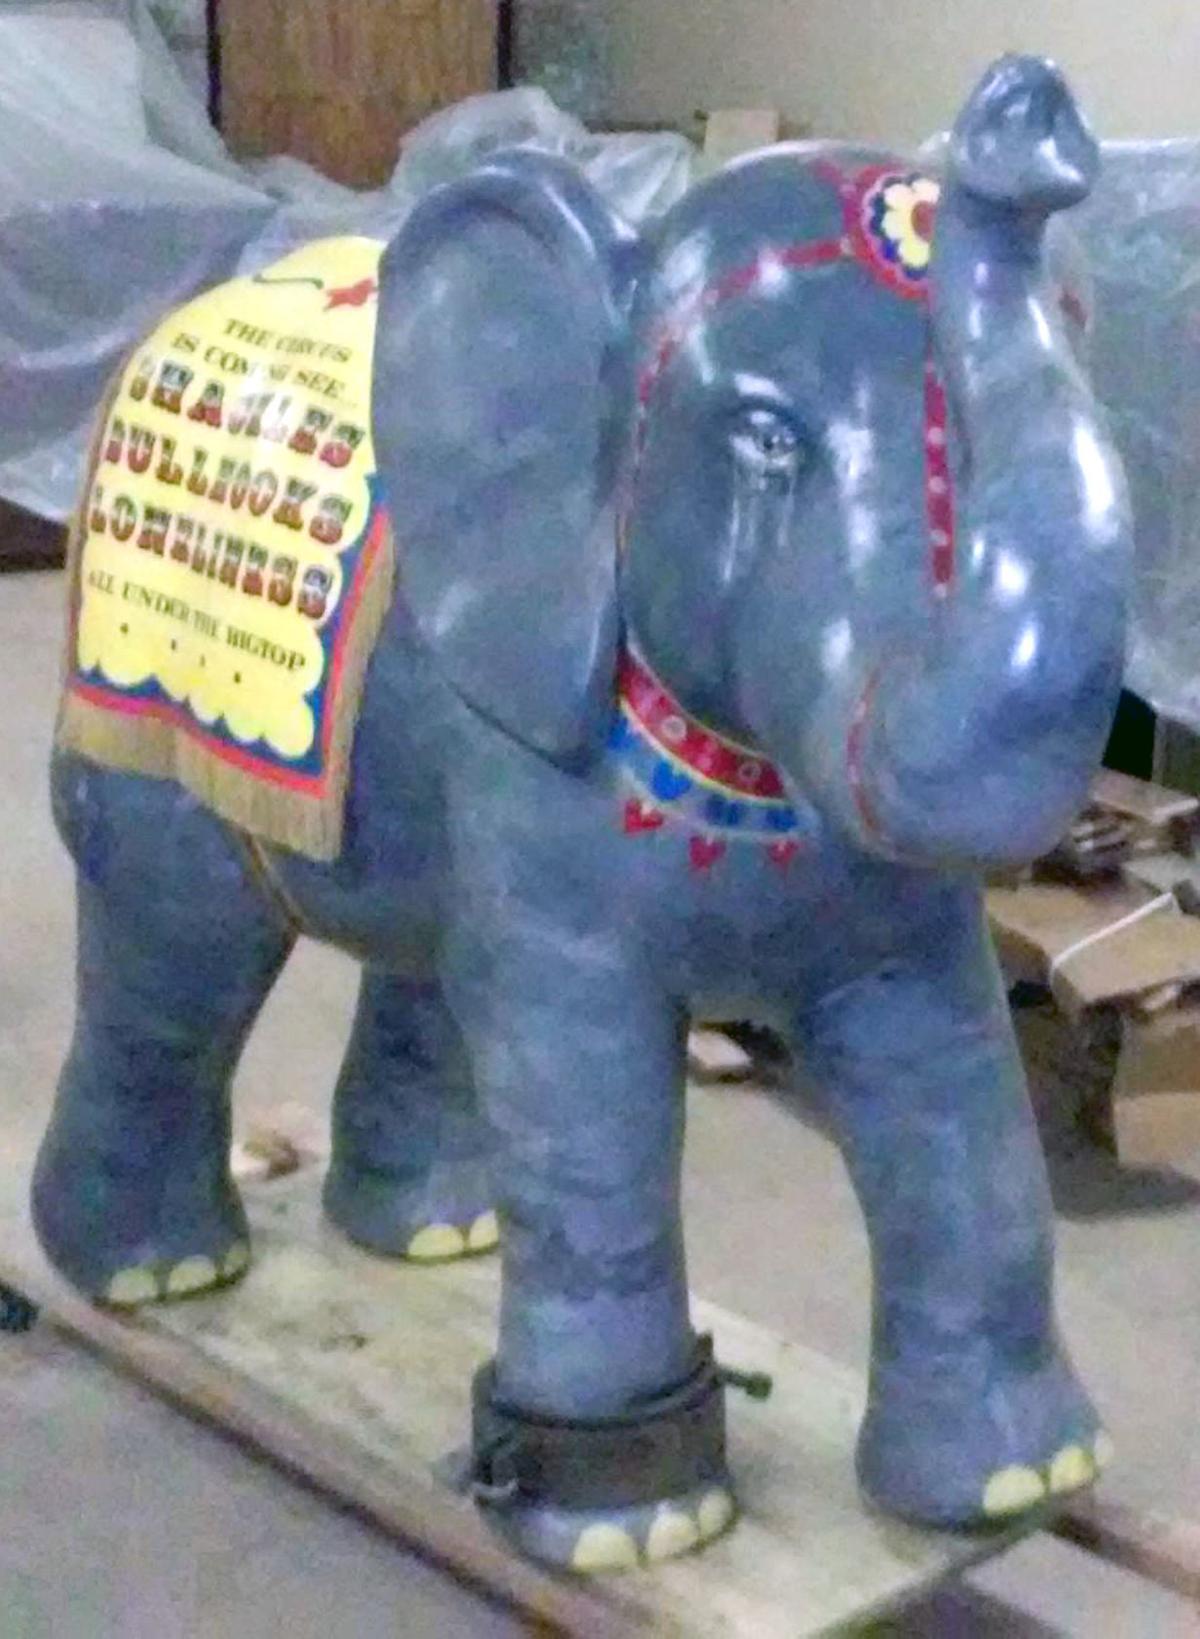 PETA elephant sculpture